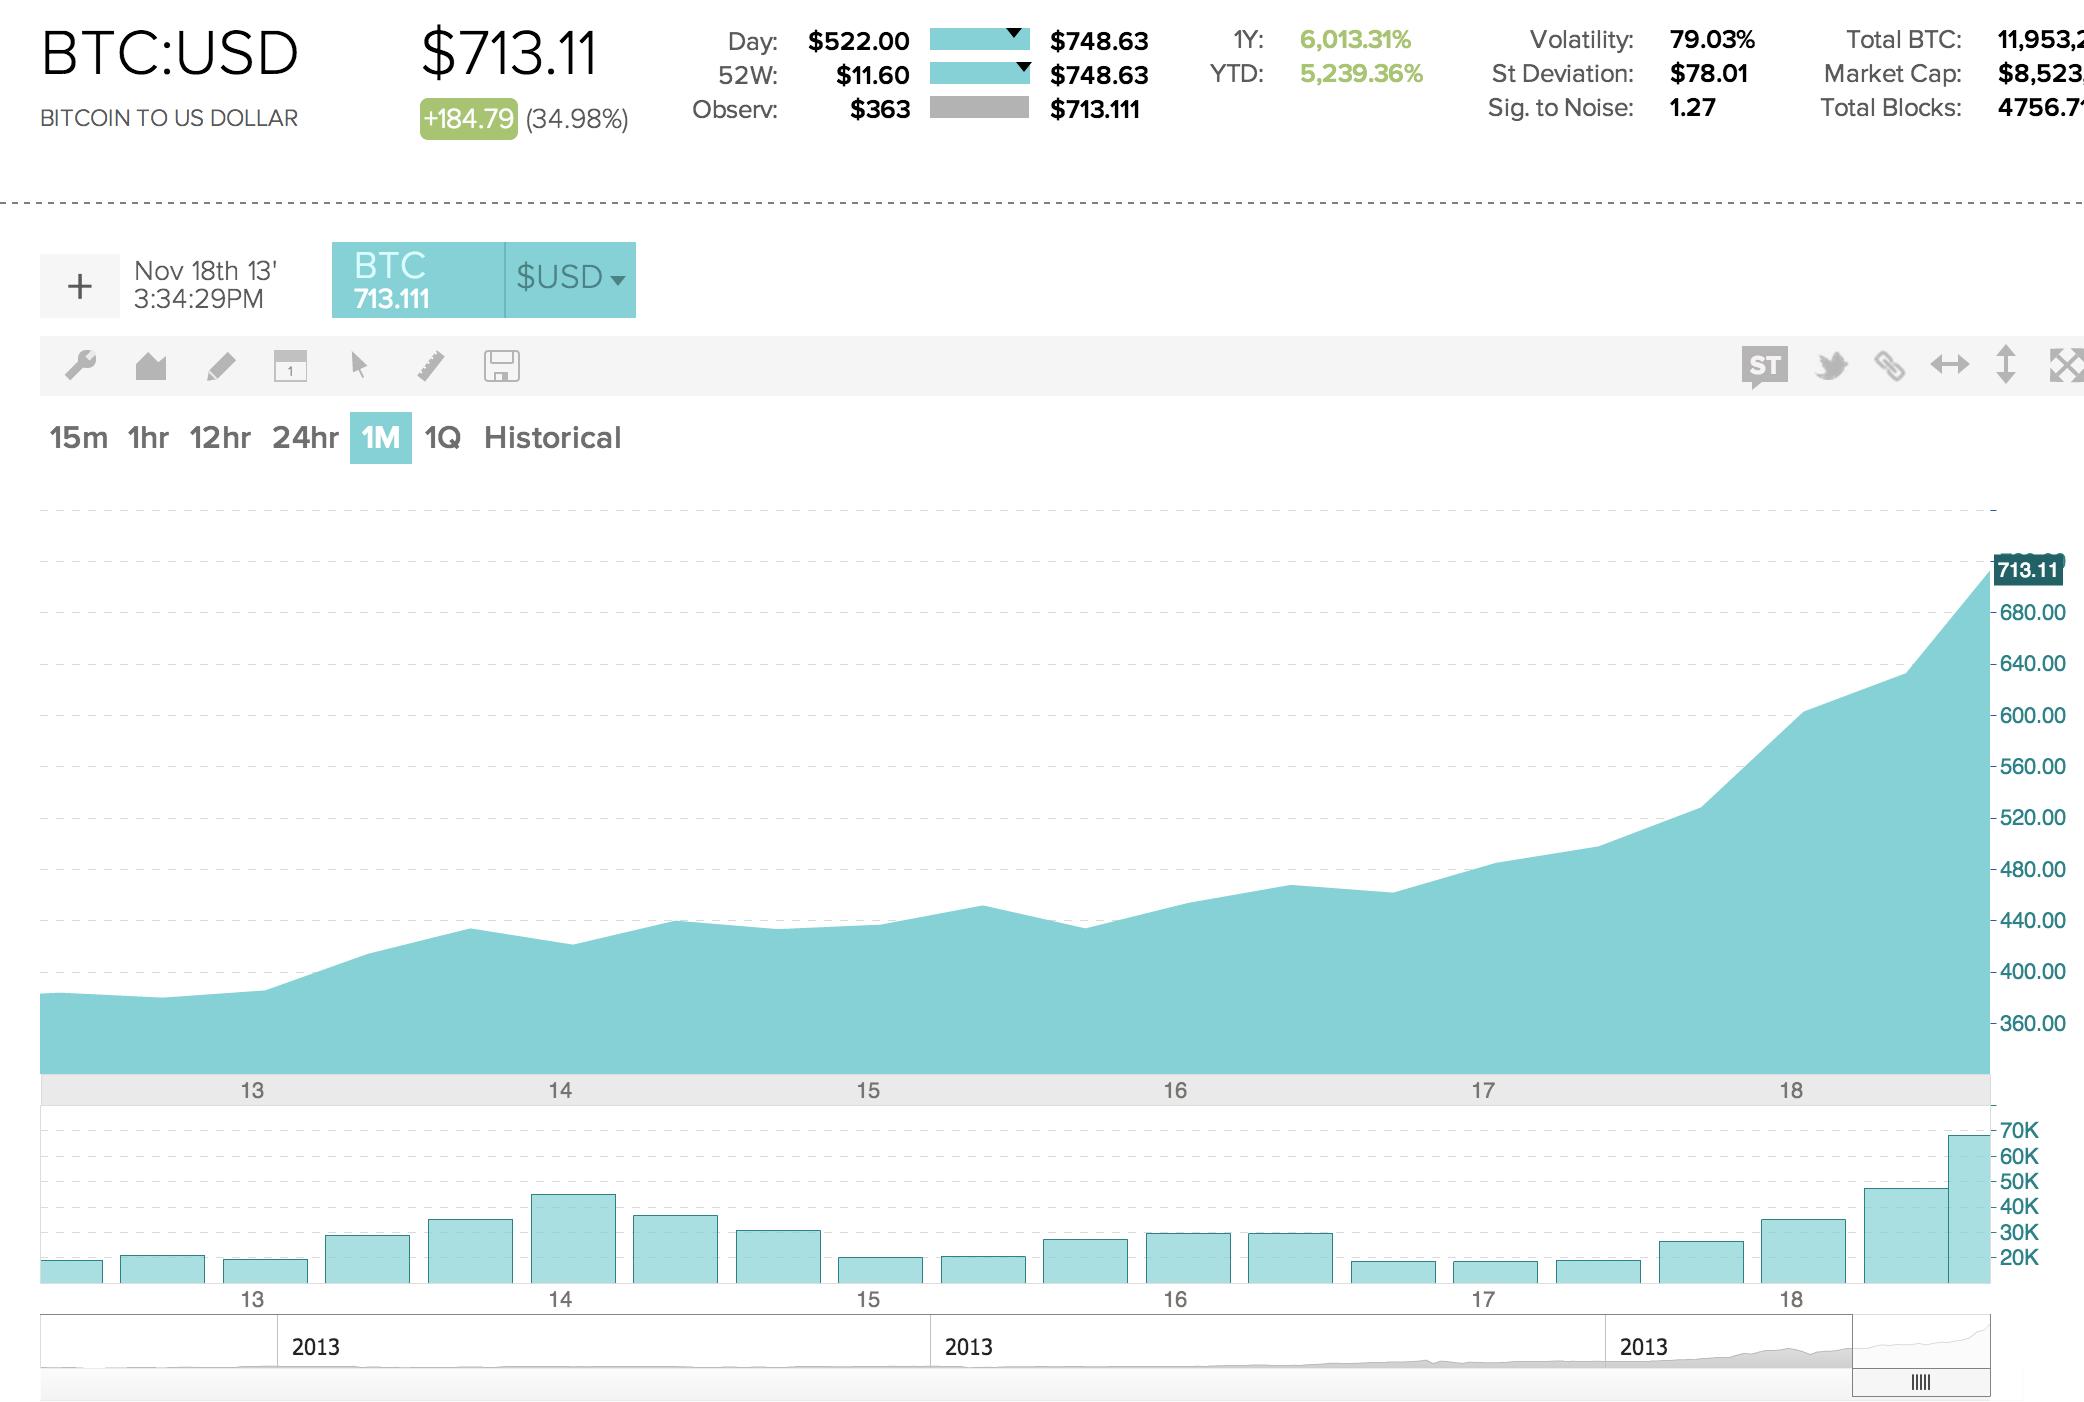 Scutify bitcoin charts